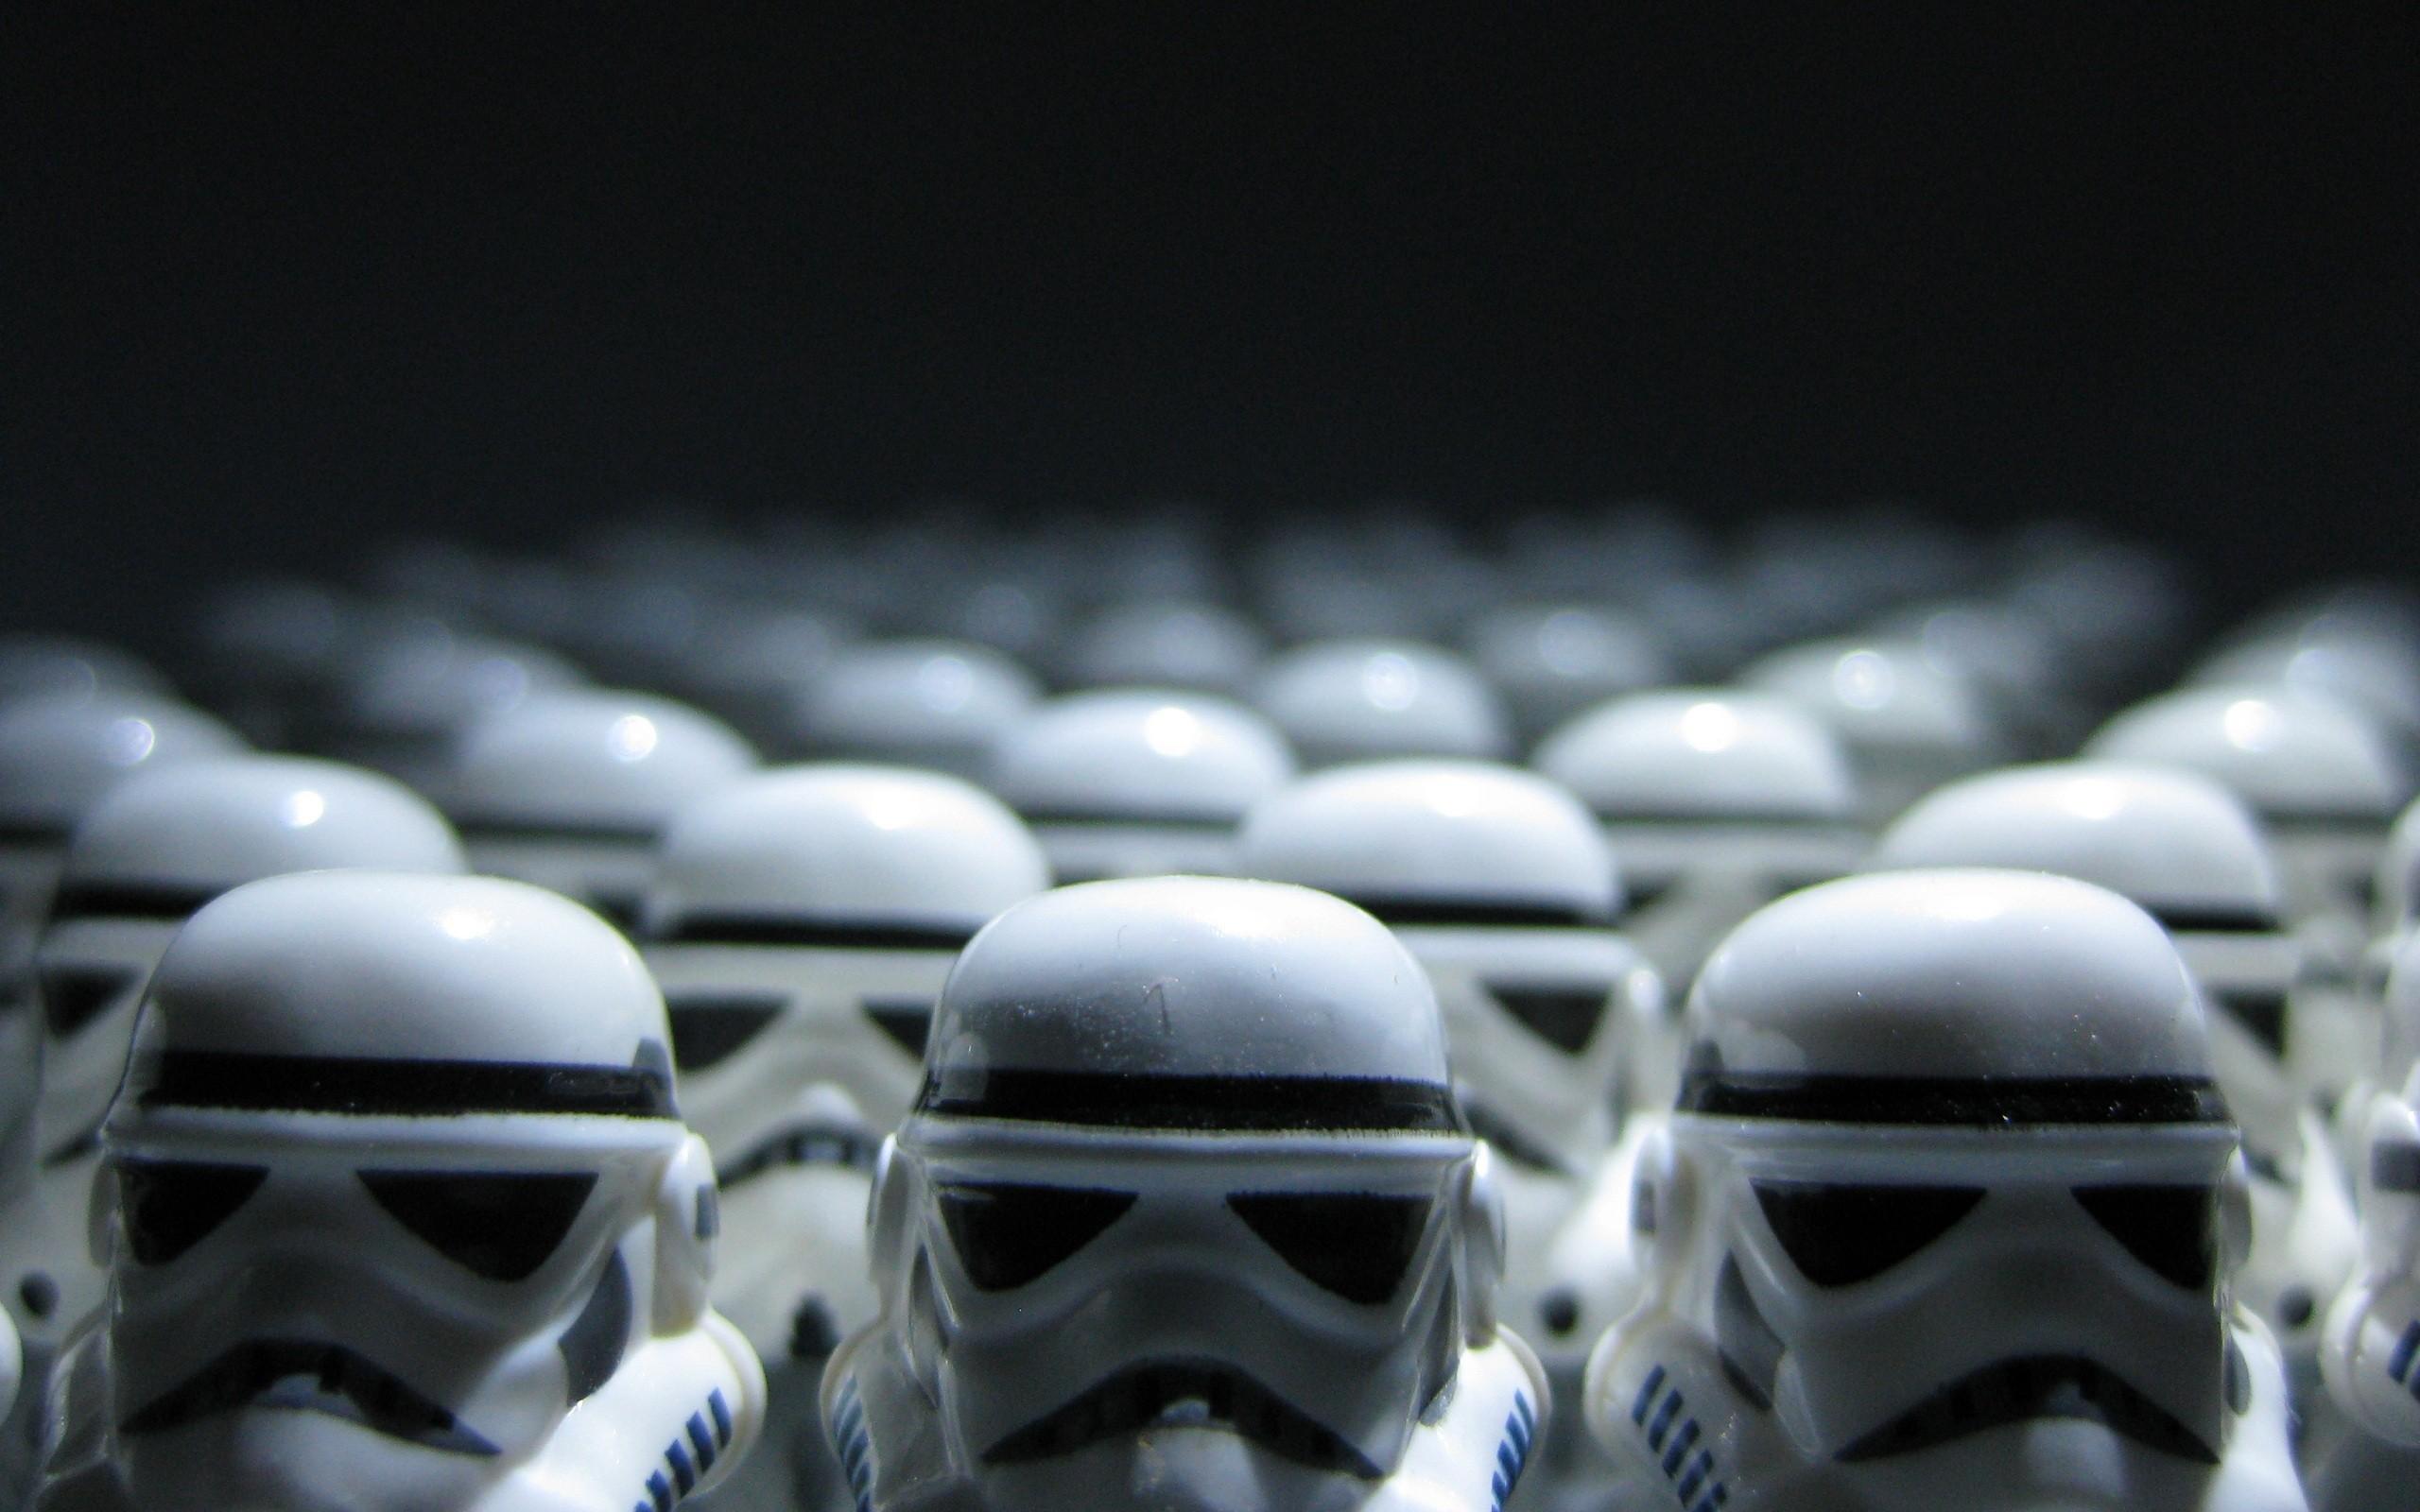 2560x1600 Lego Starwars Stormtroopers desktop PC and Mac wallpaper 2560x1600